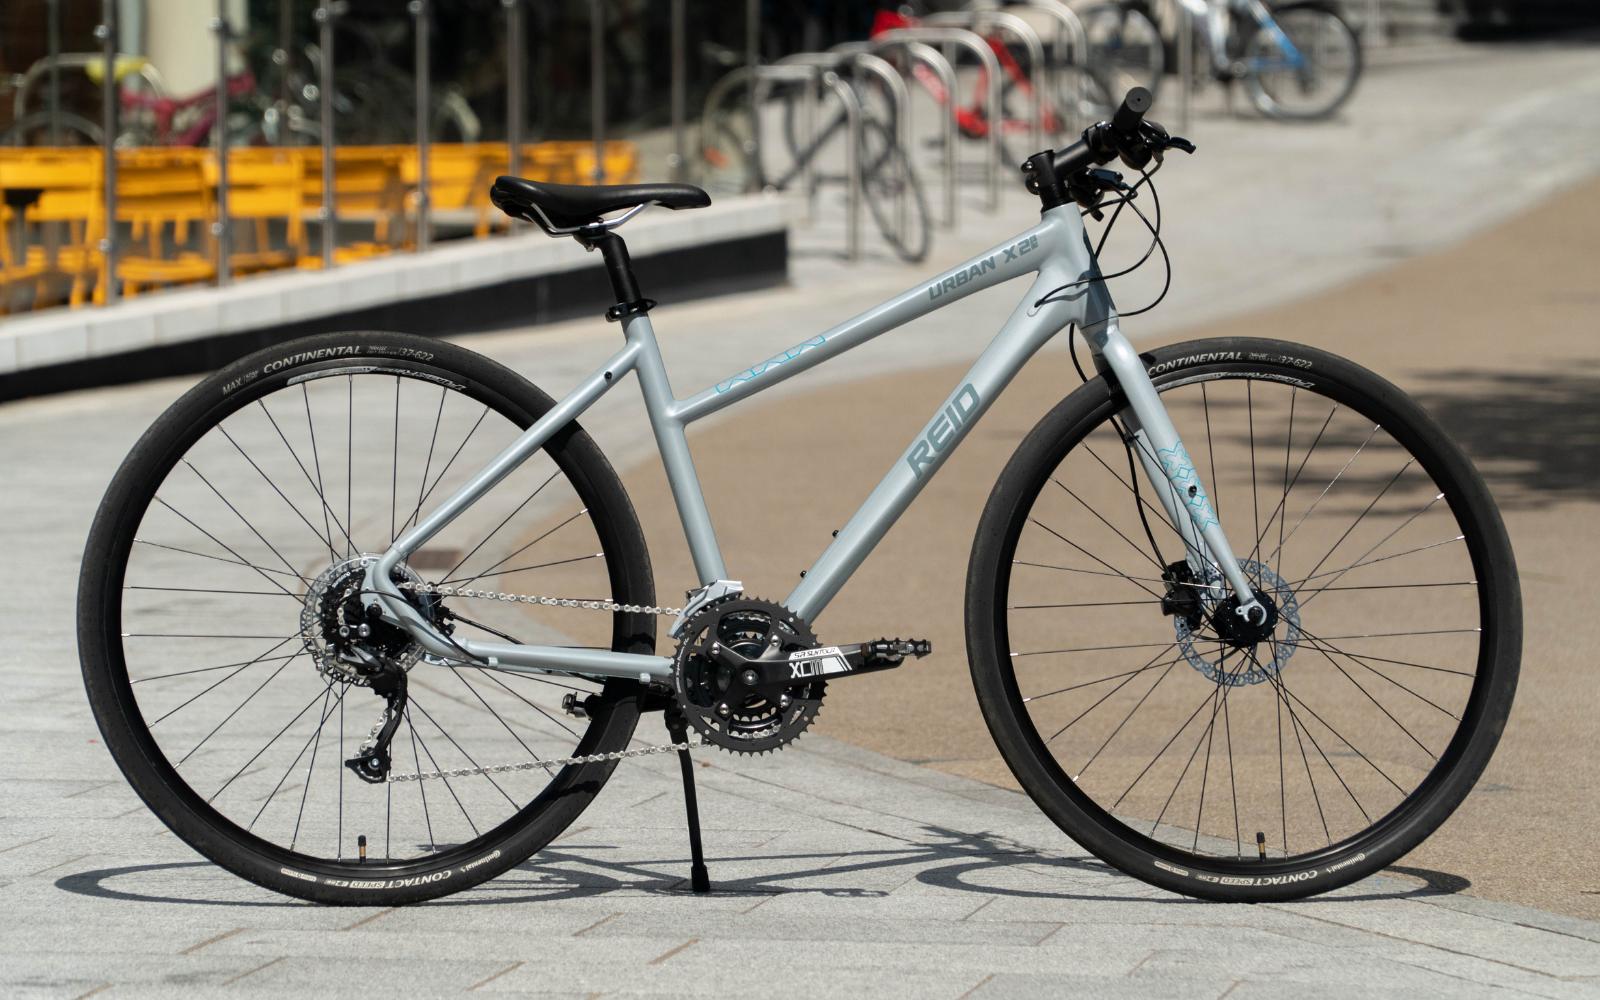 94 - Reid ® - Urban X2 WSD Bike